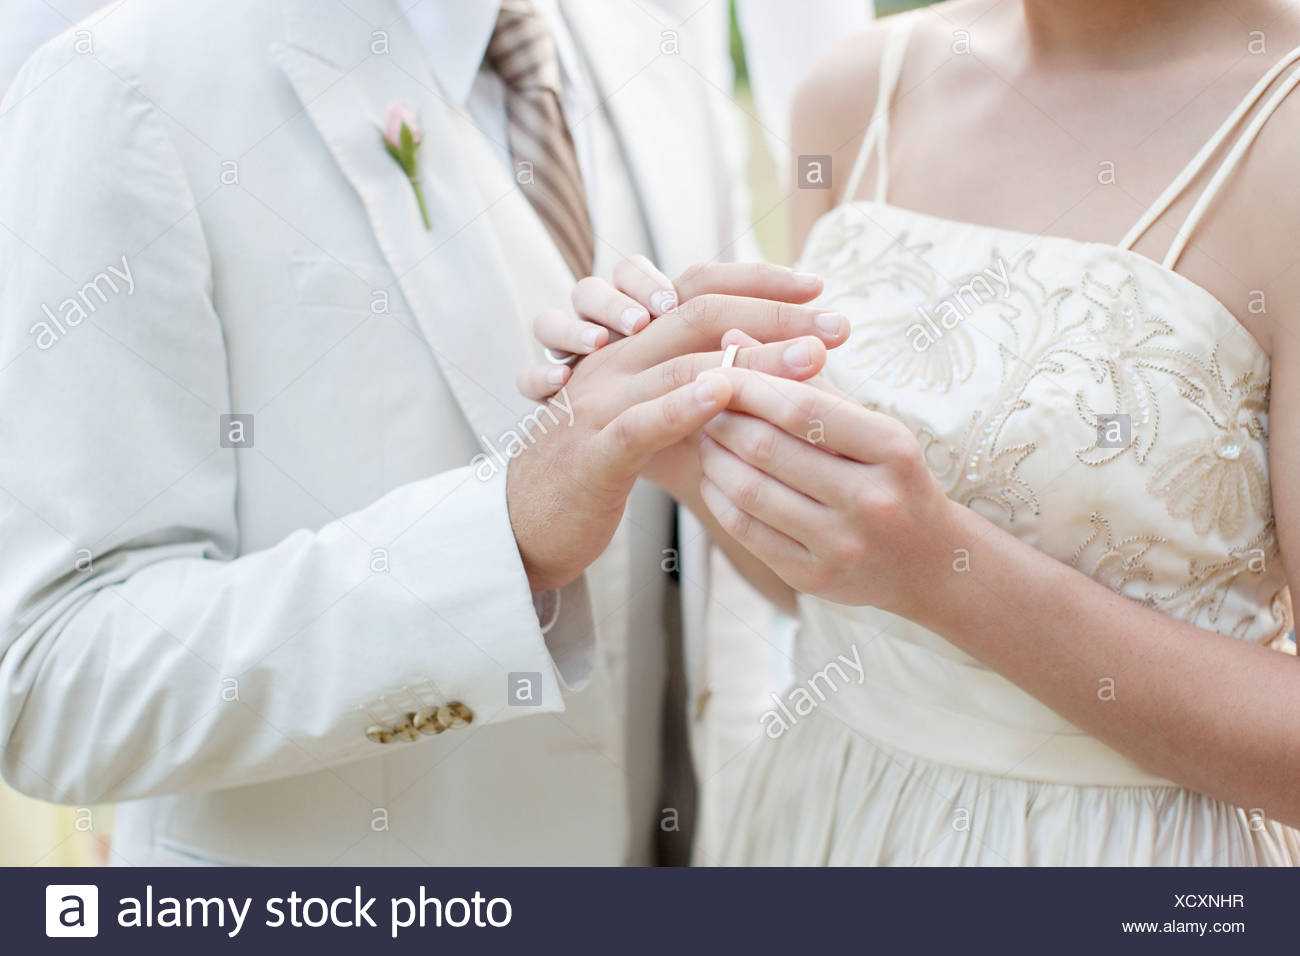 Bride putting ring on groom's finger - Stock Image